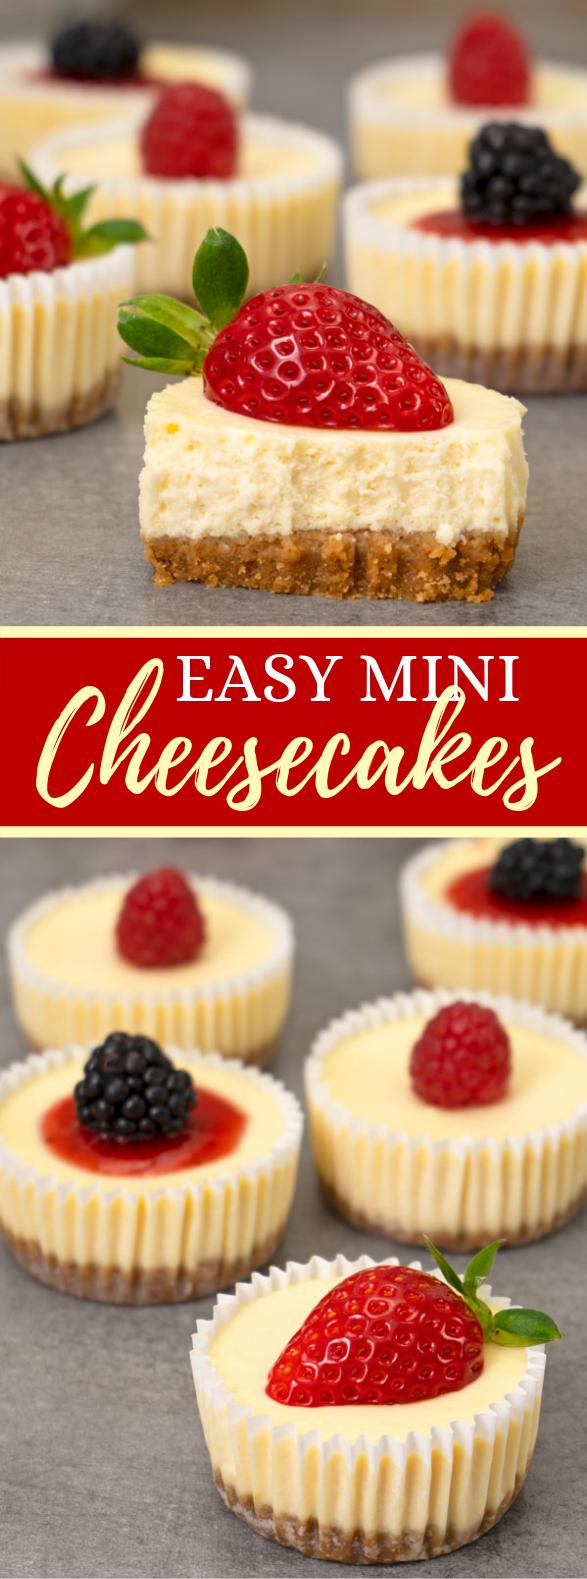 Easy Mini Cheesecakes #desserts #berries